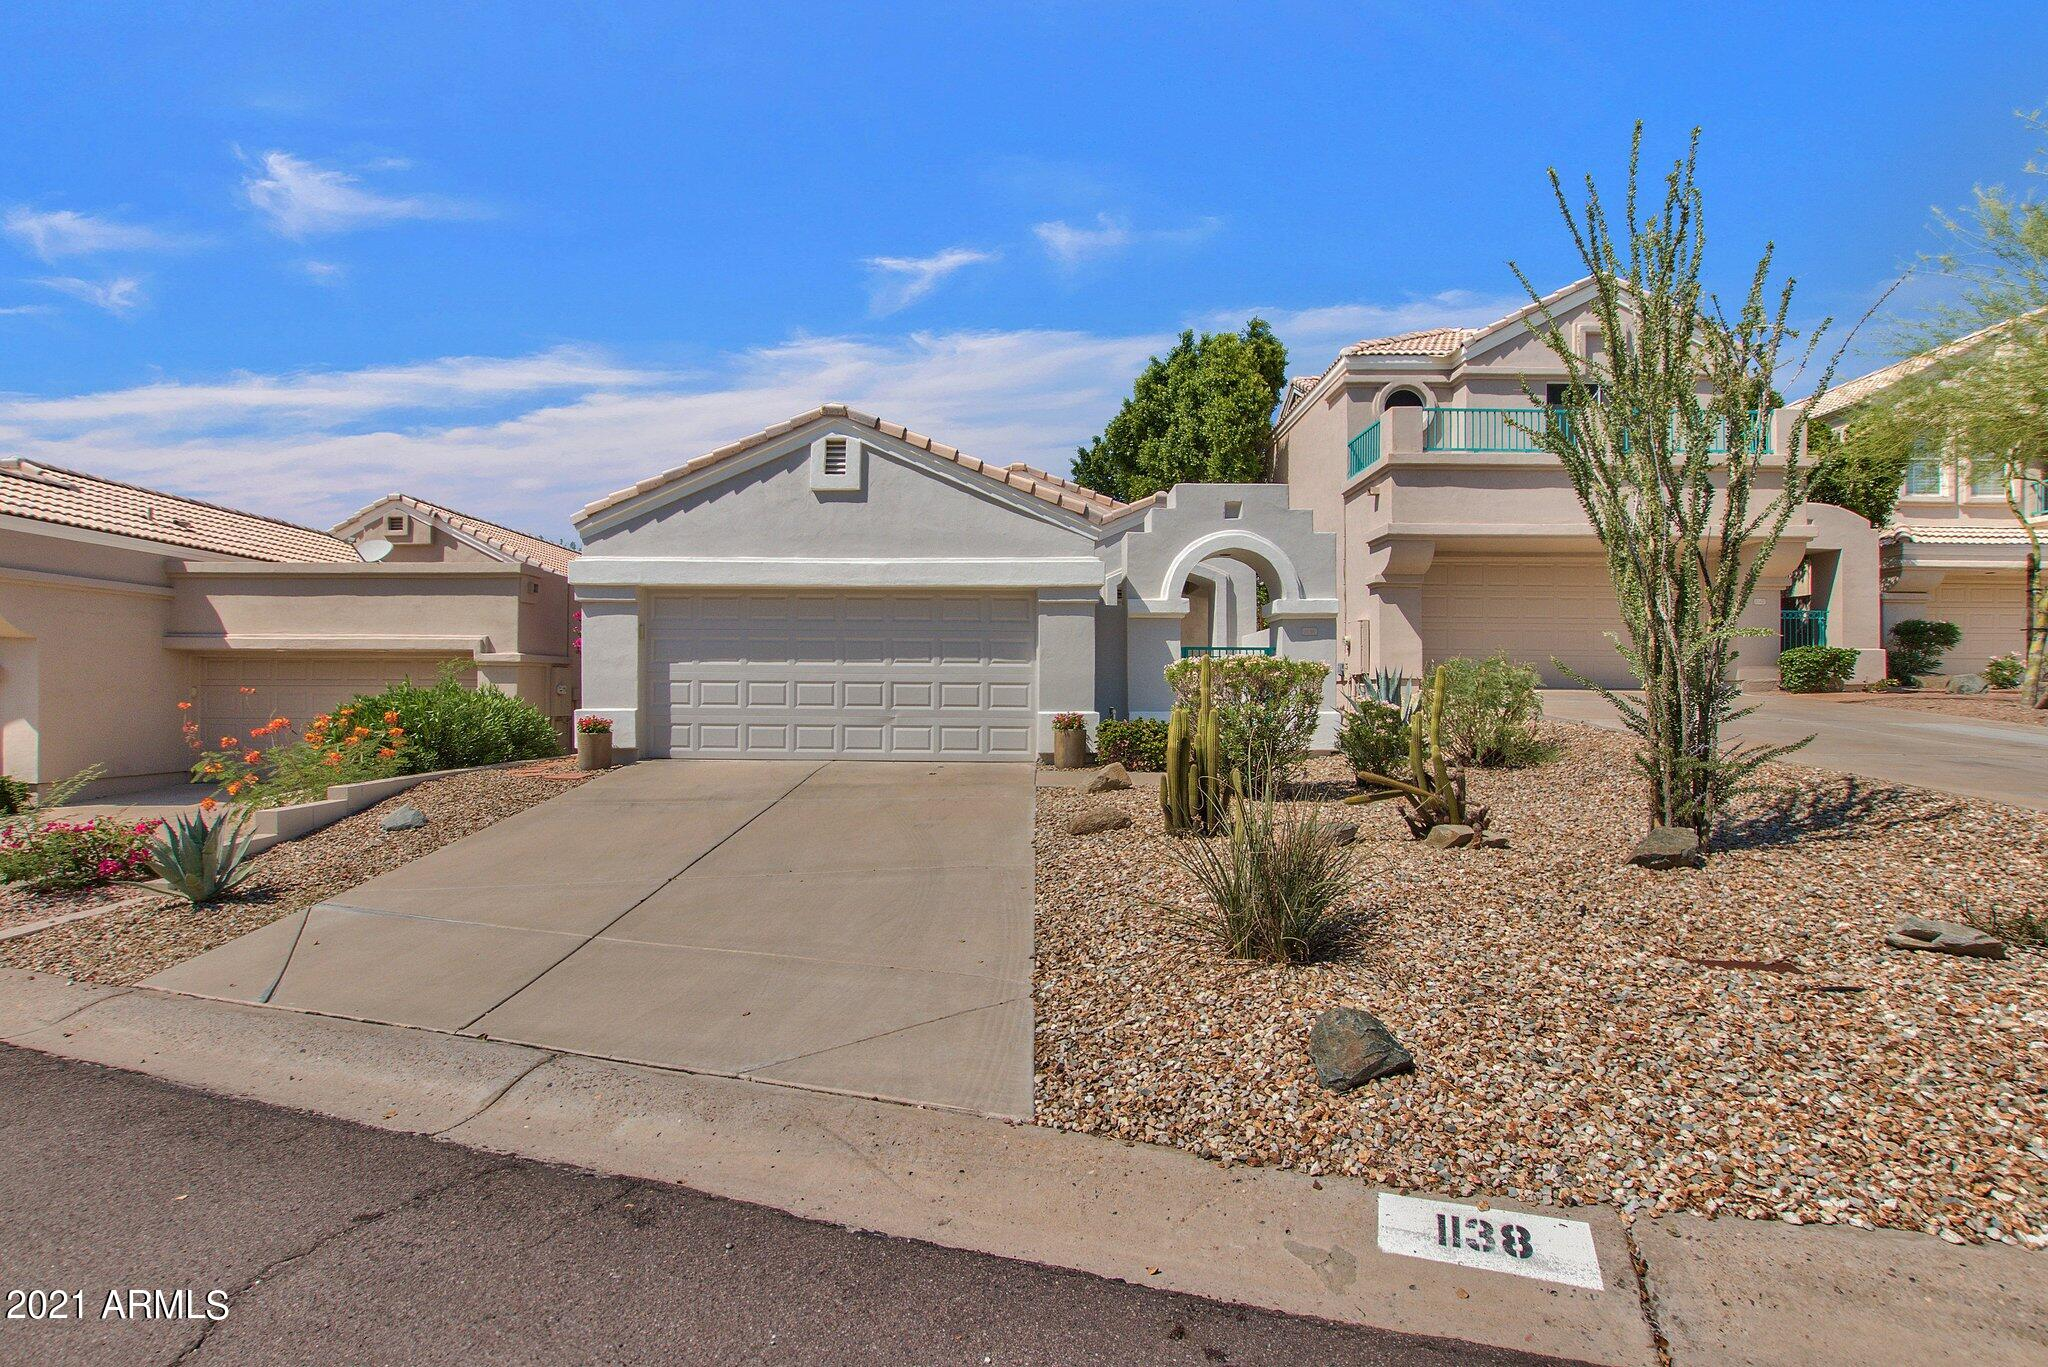 1138 E Amberwood Drive, Phoenix AZ 85048 - Photo 1